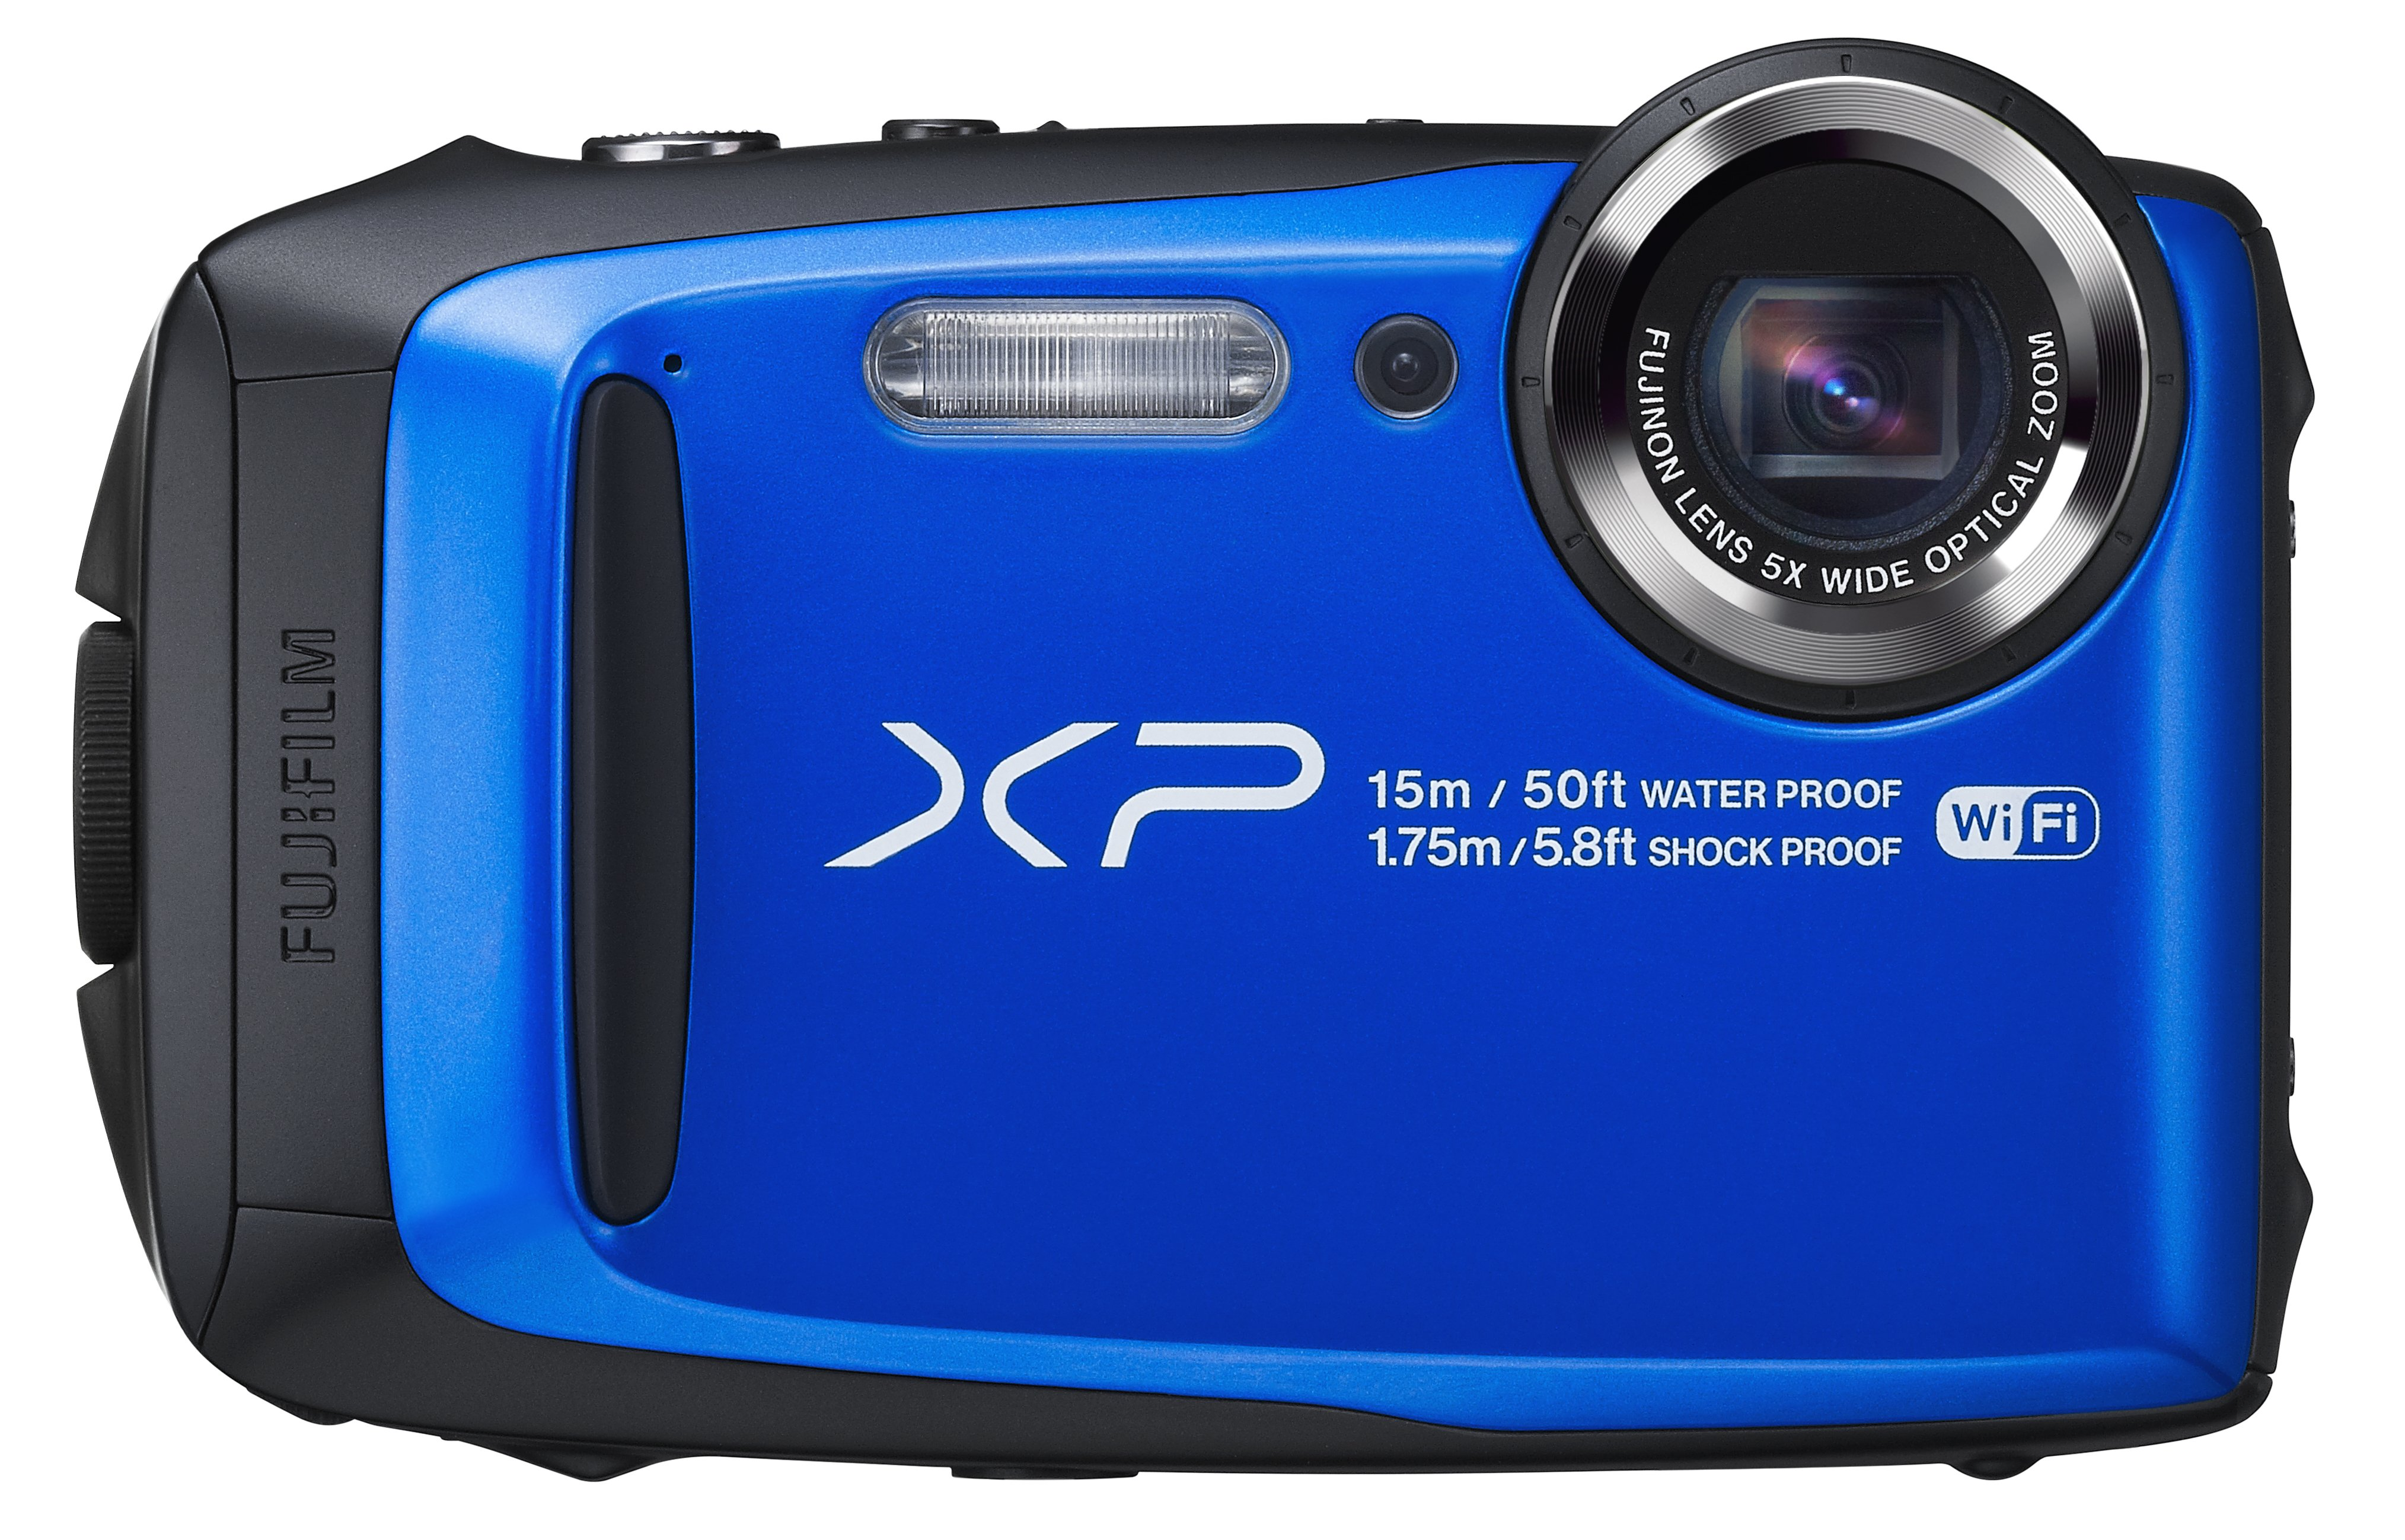 FUJIFILM FinePix XP90 modrý + Fujifilm plovoucí řemen zdarma